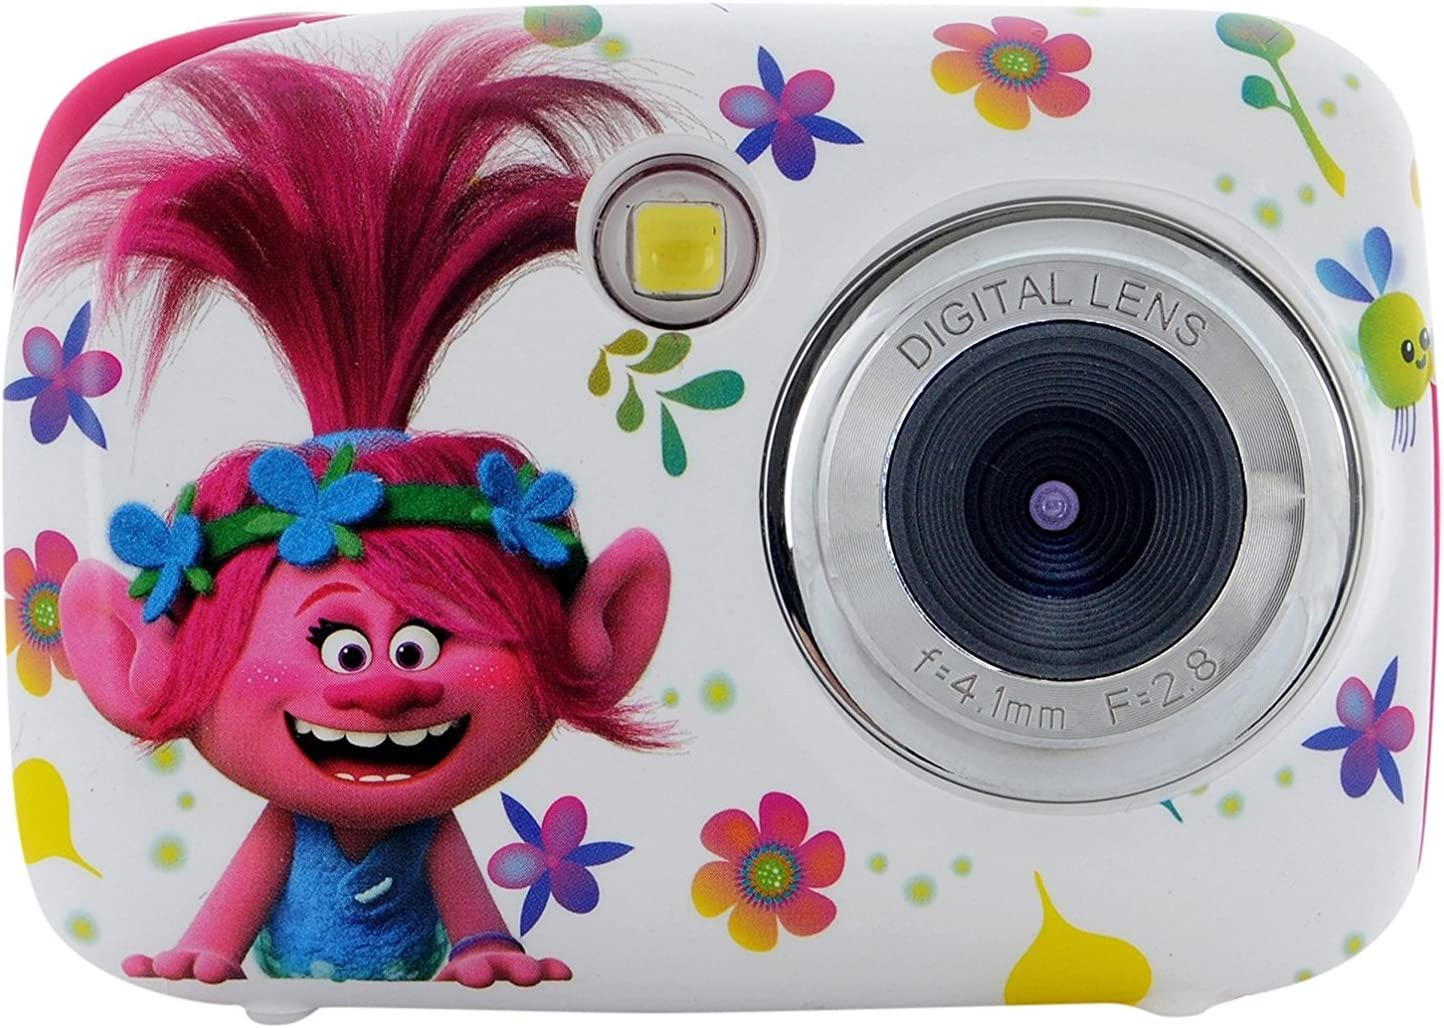 Digitalkamera 10.1 MP Trolls Sakar CA2-10801-INT Elektronisches Spielzeug